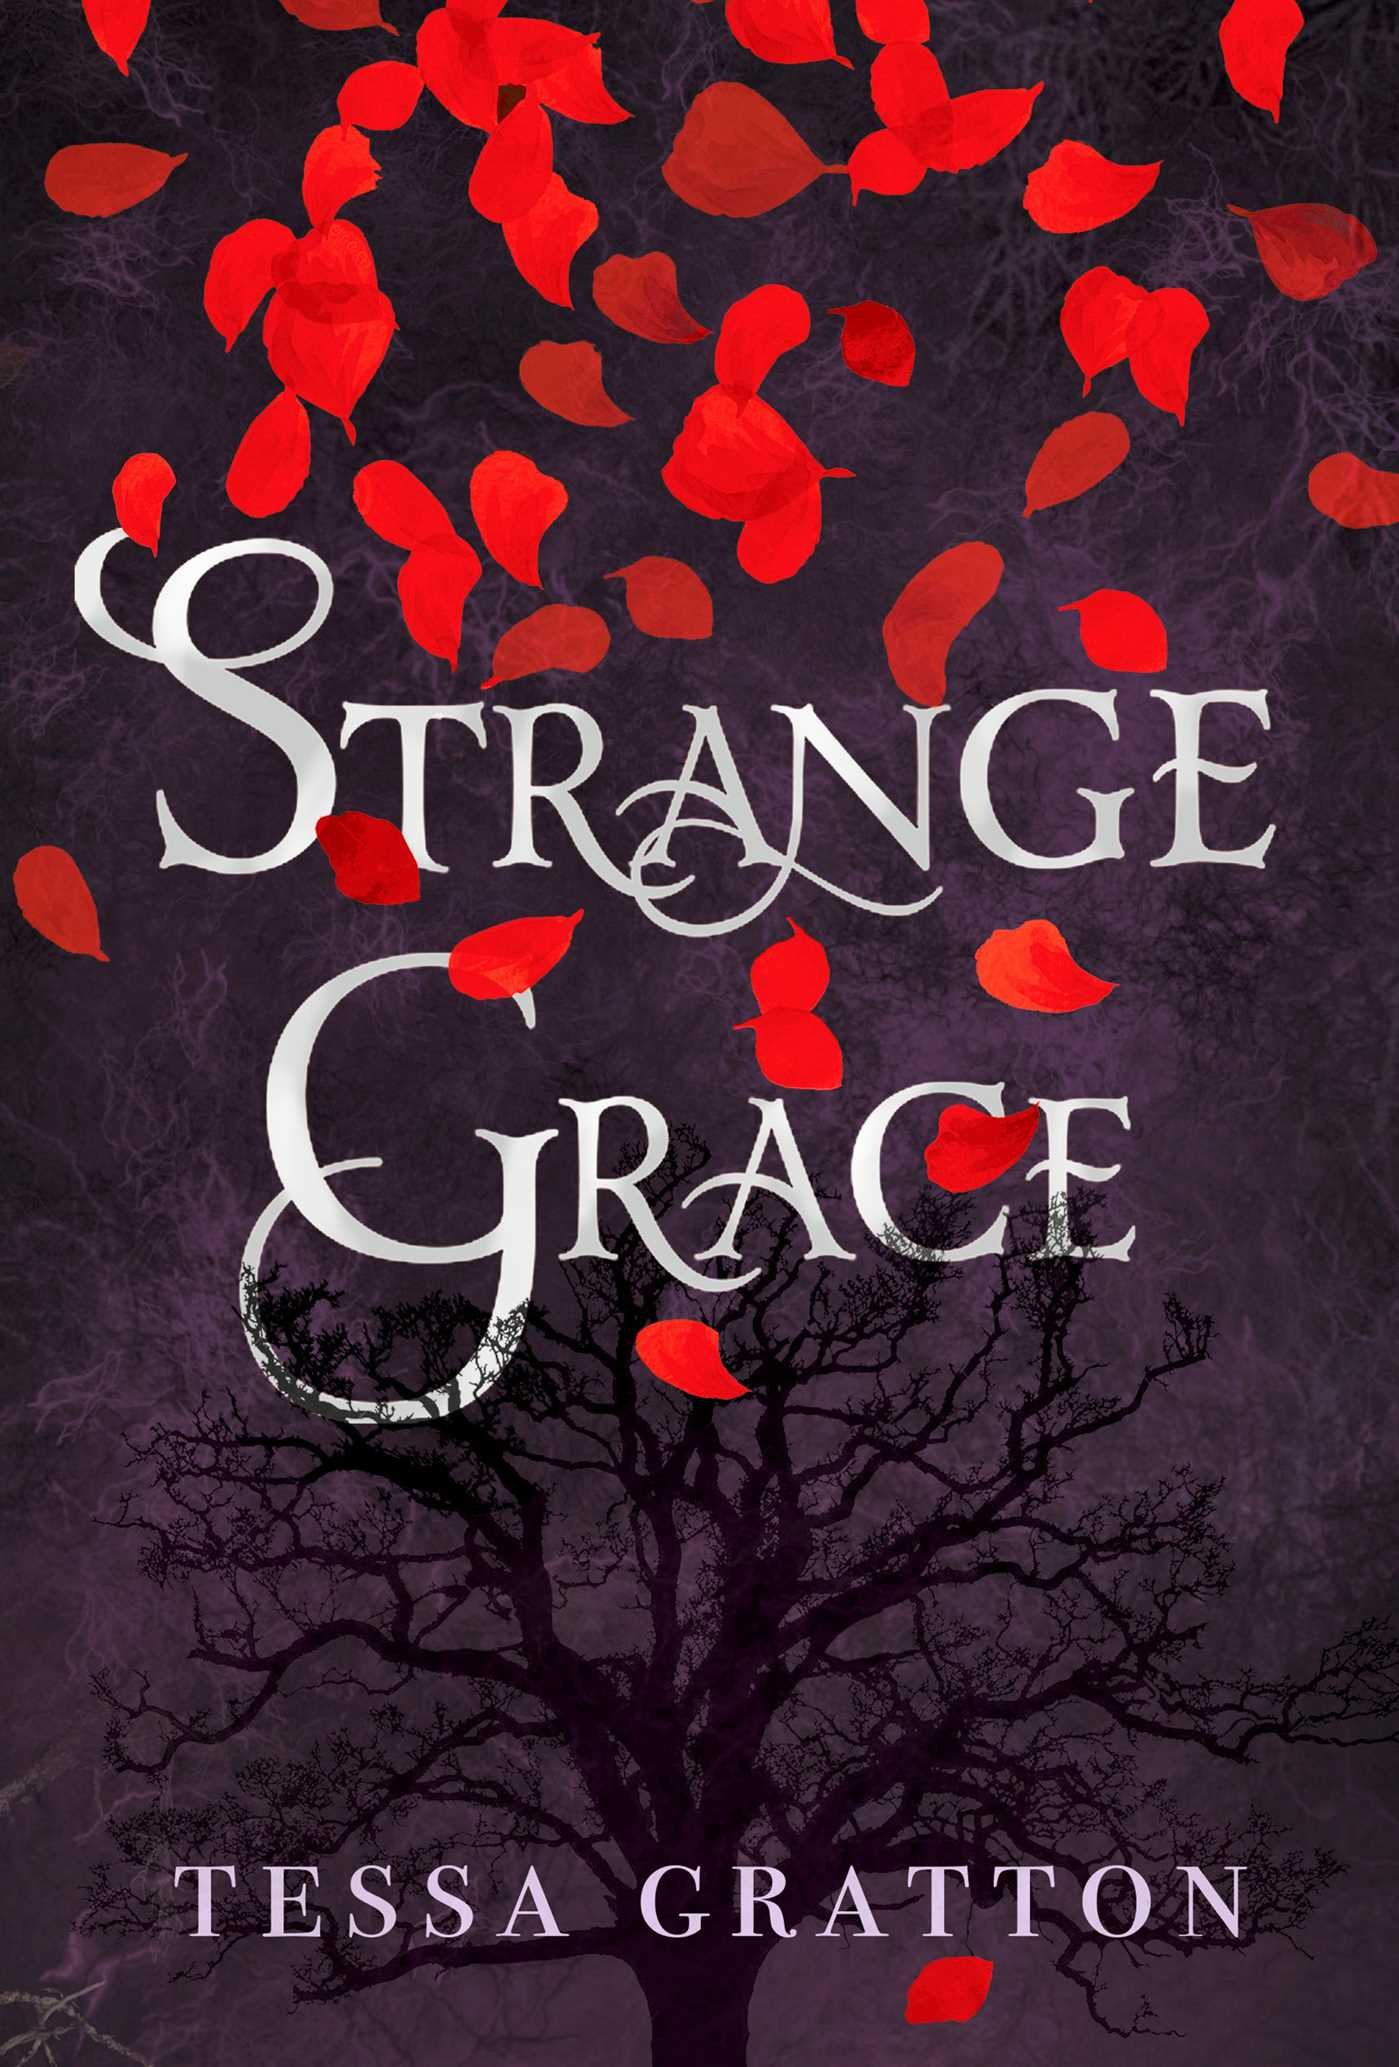 Strange Grace: Gratton, Tessa: Amazon.com.mx: Libros